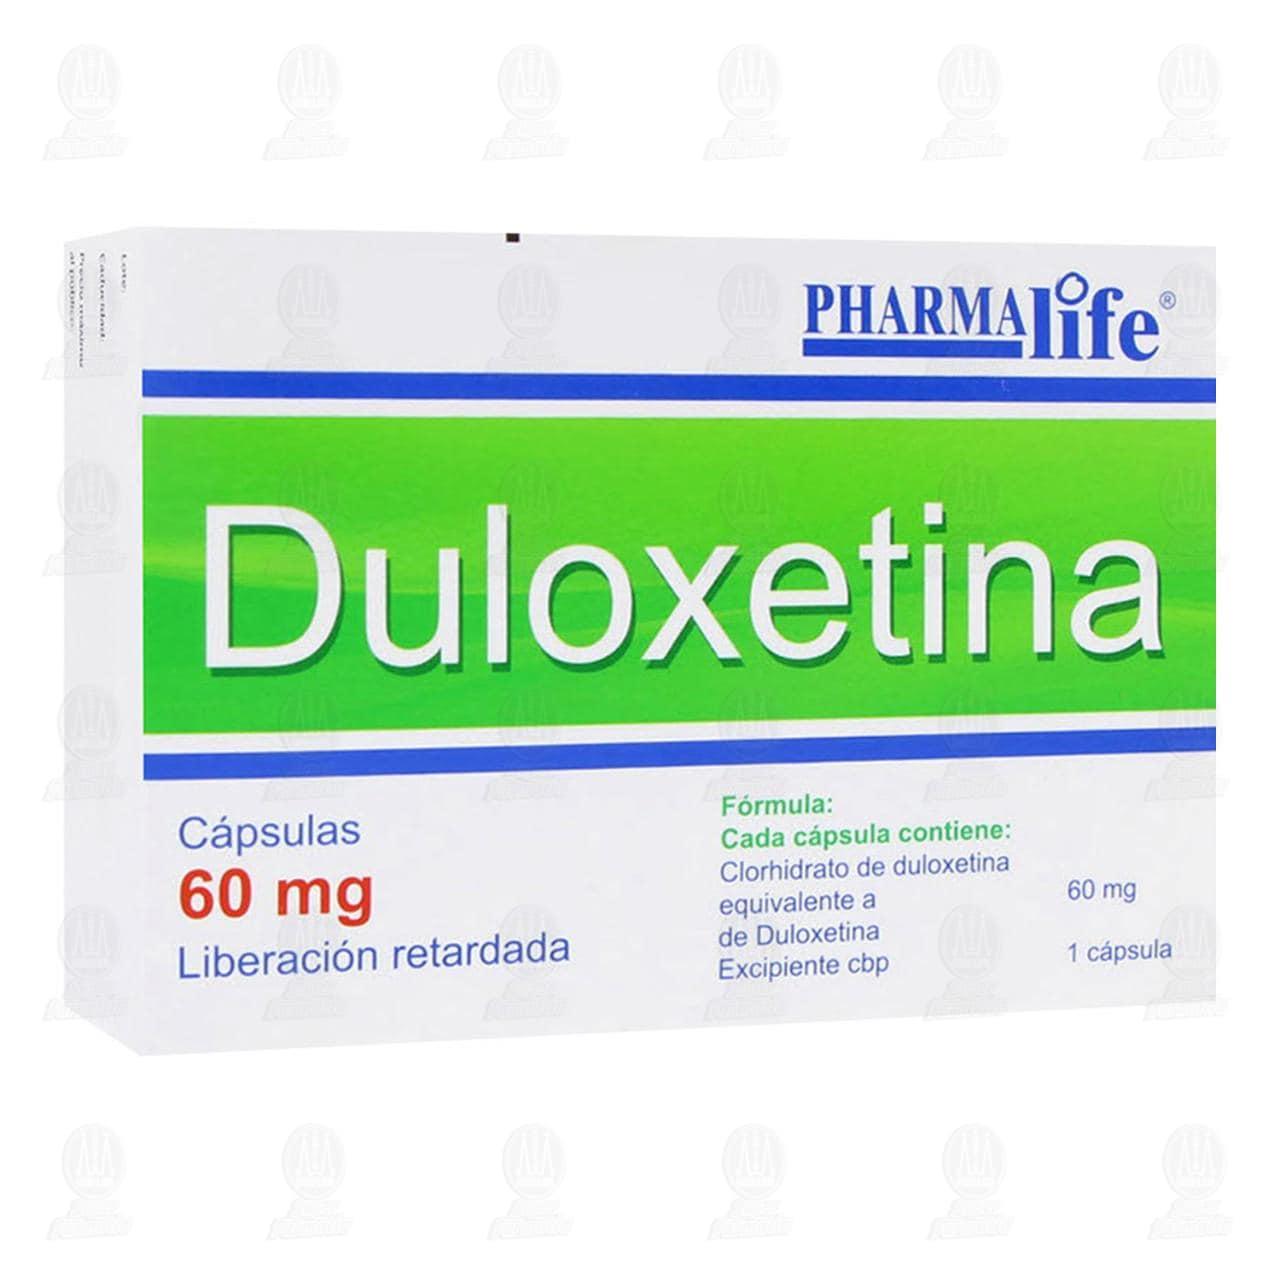 Comprar Duloxetina 60mg 14 Cápsulas Liberación Retardada Pharmalife en Farmacias Guadalajara